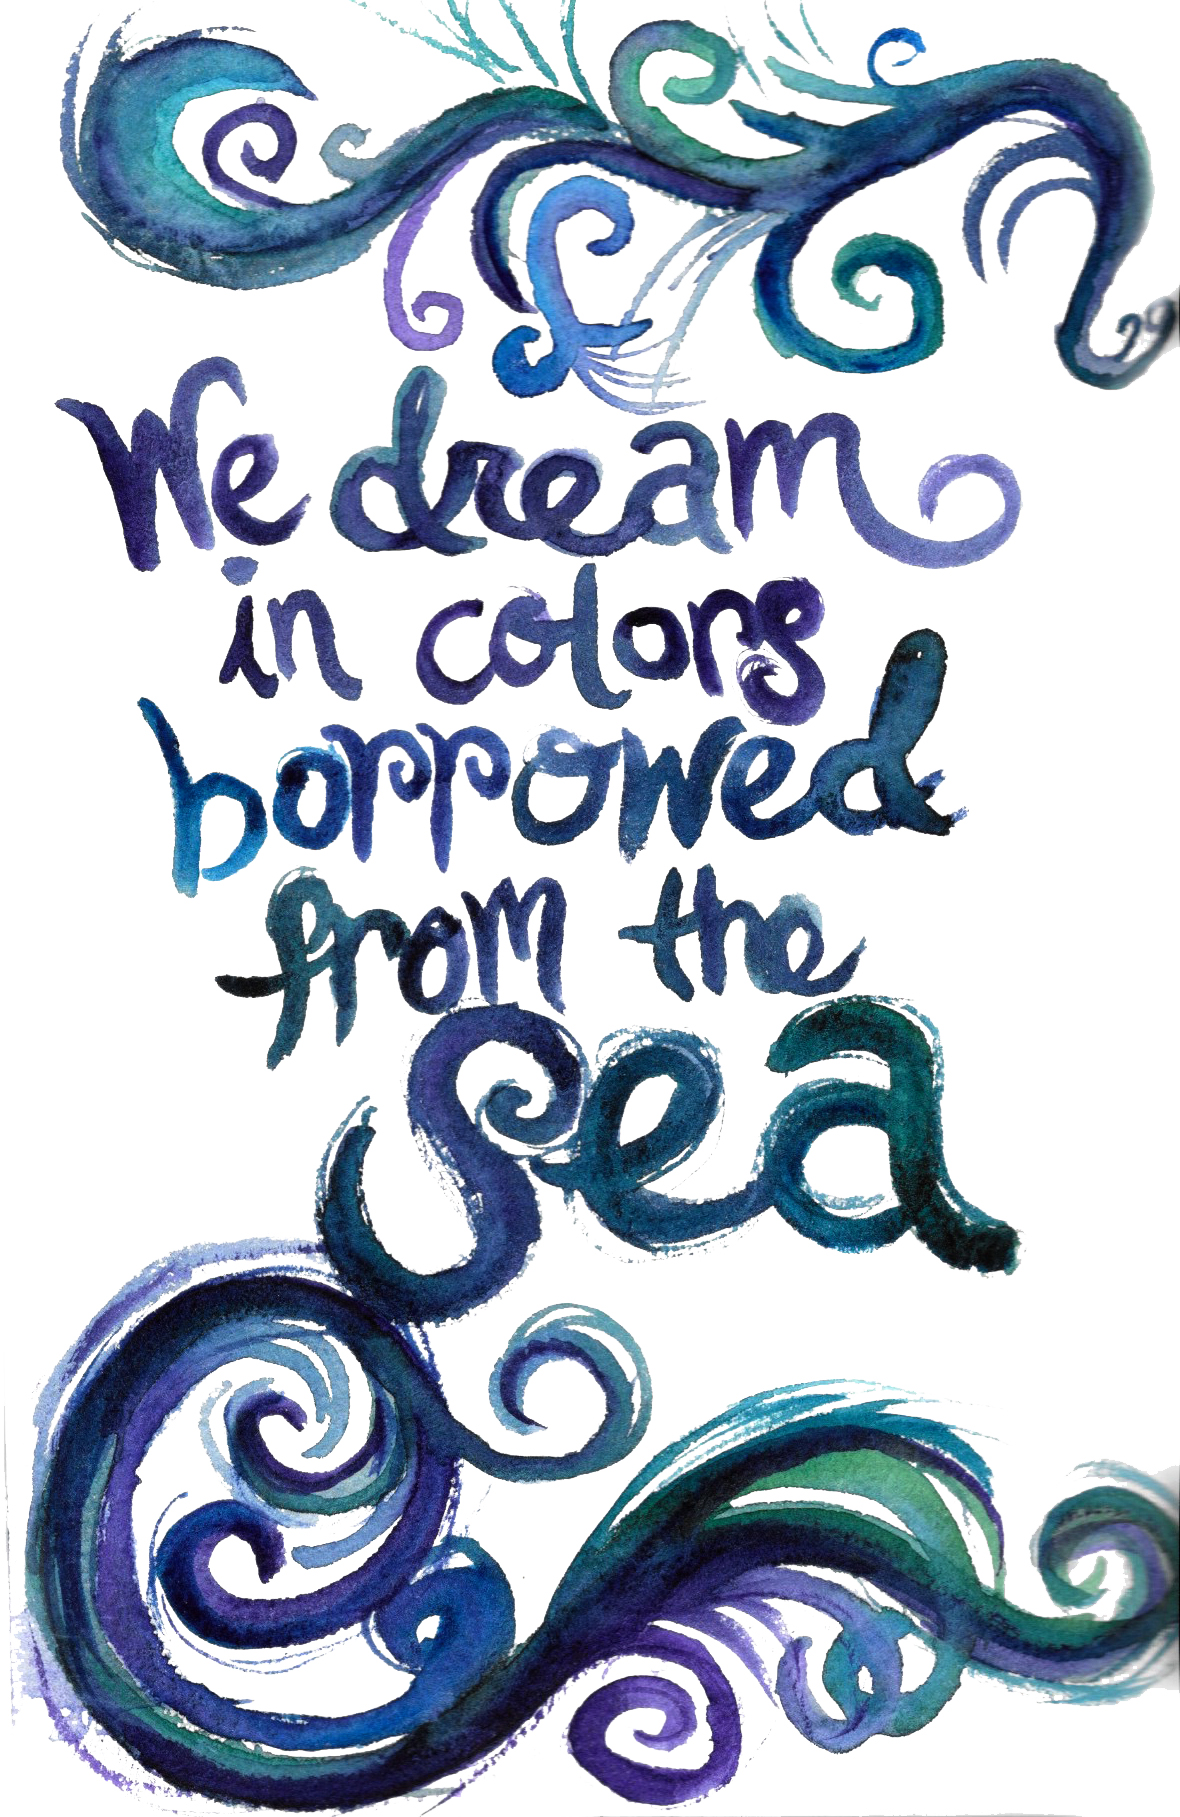 colors of th sea.jpeg